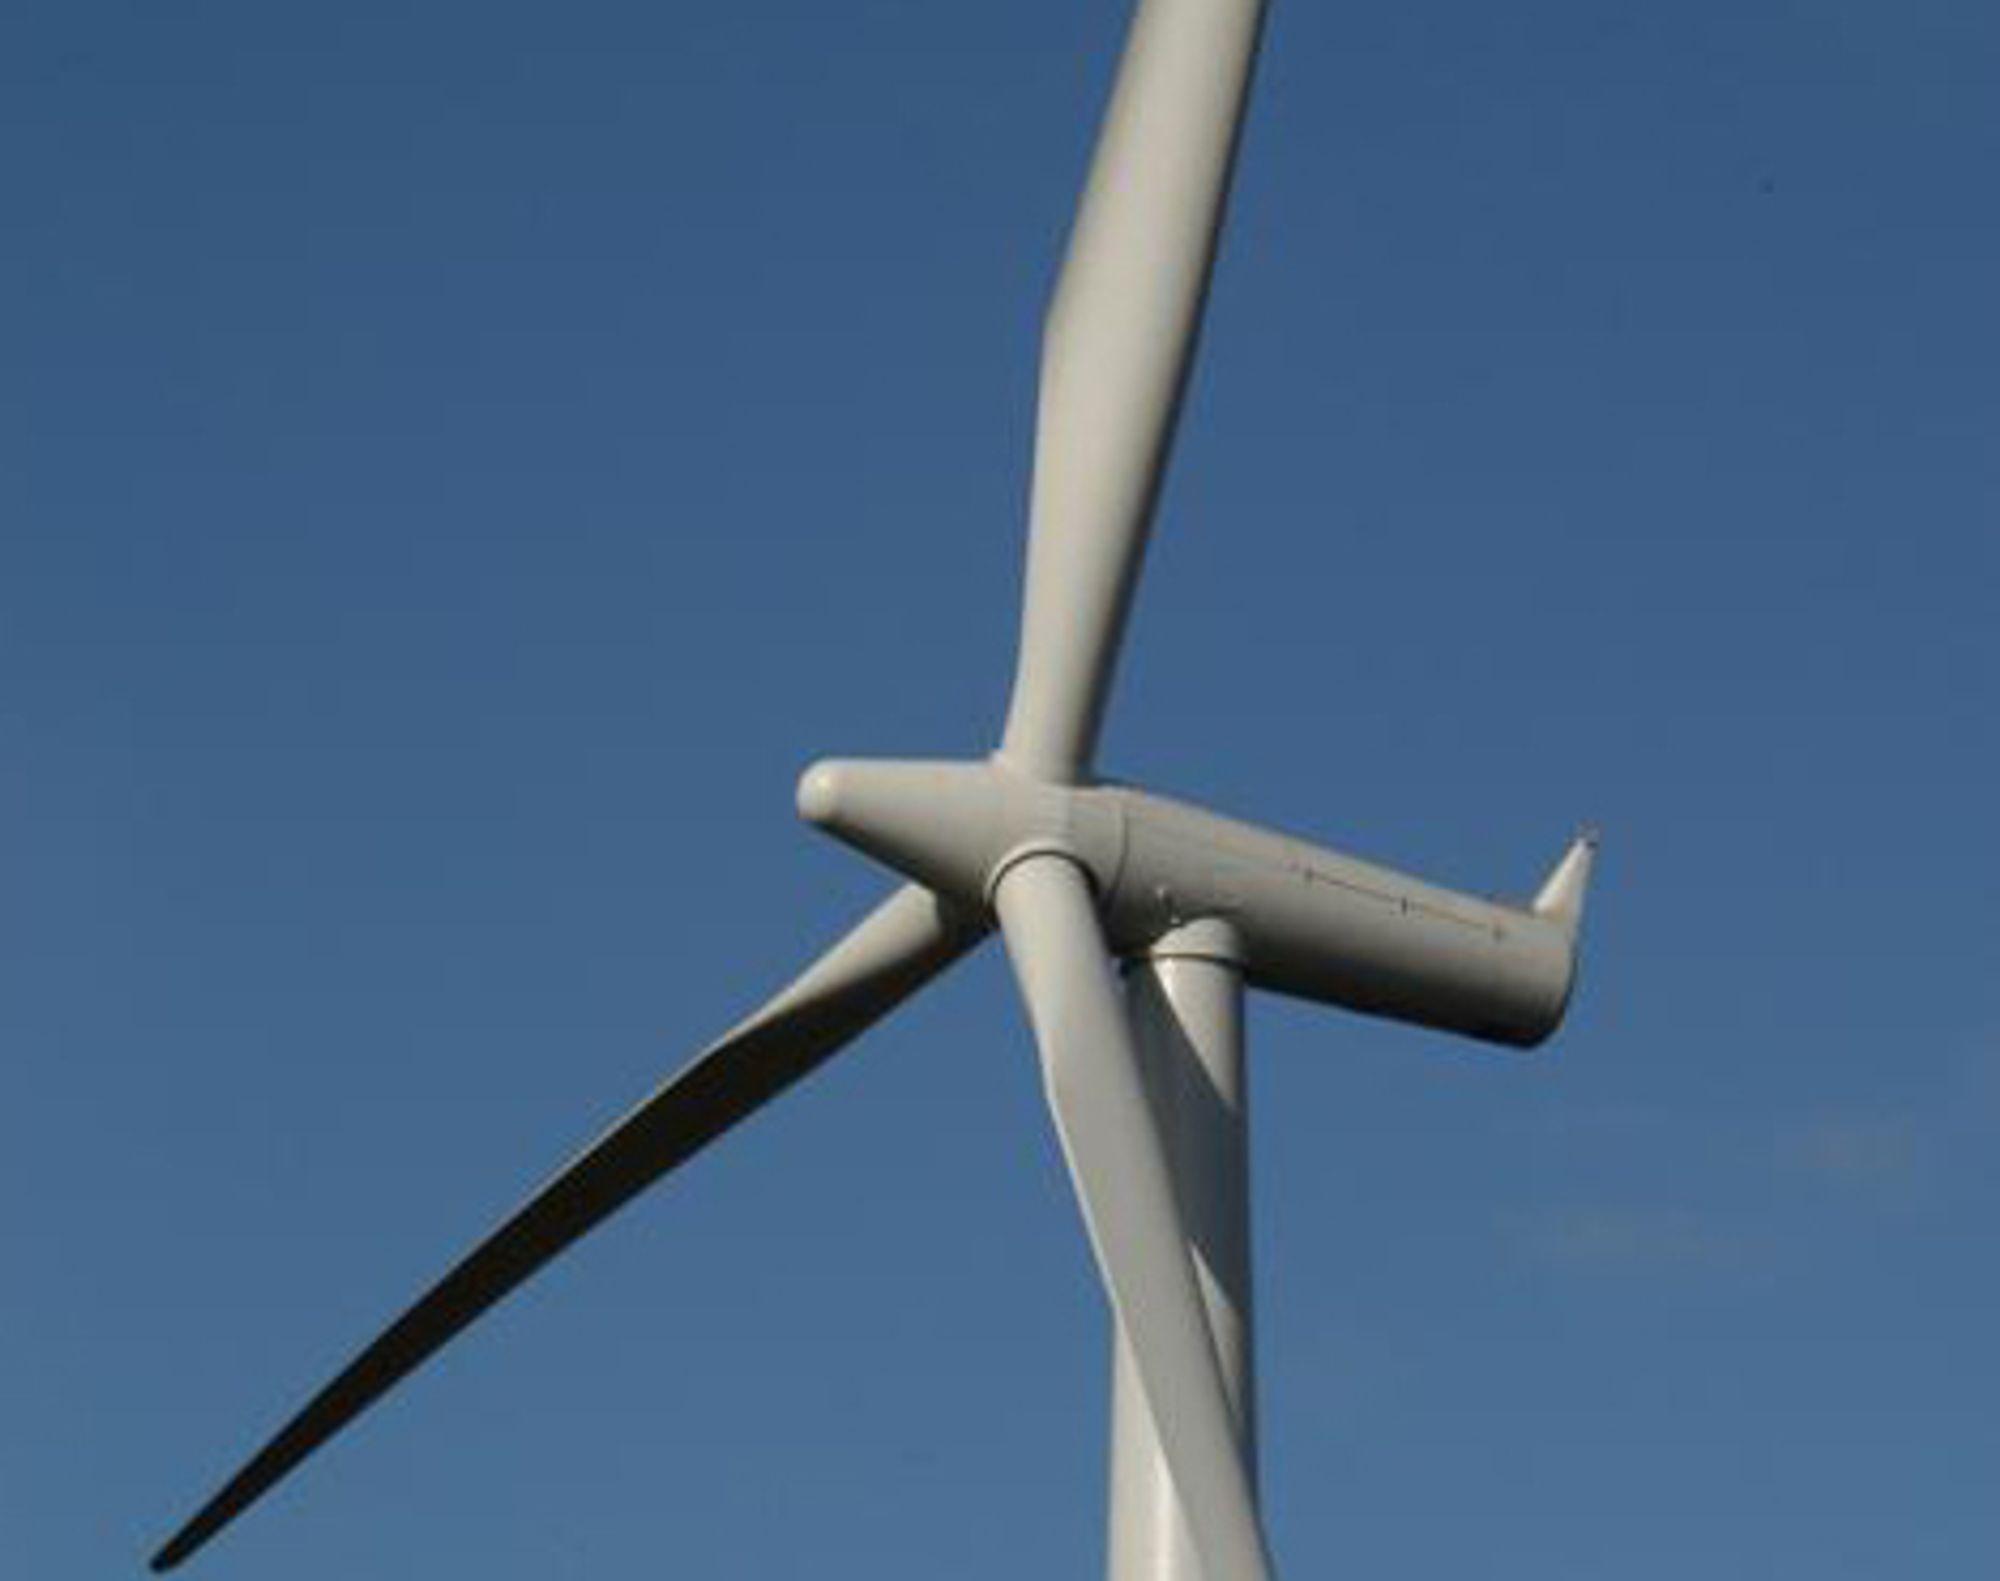 Fra 2010 skal vindkraftparken på Jæren produsere 260 GWh årlig.